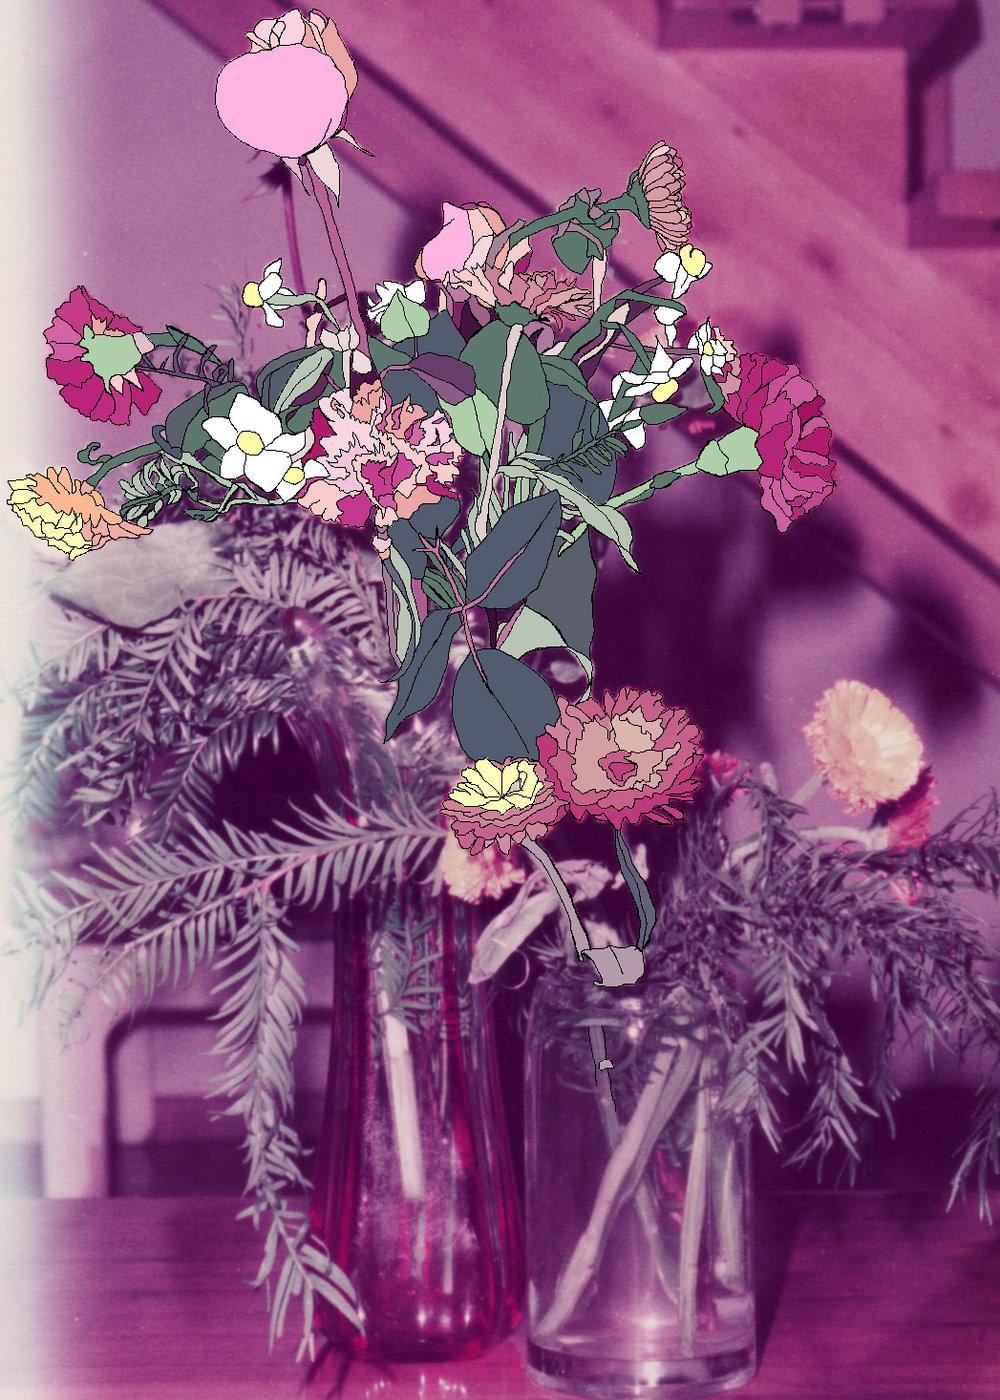 Flowers, archival ink print, 60 x 45 cm, 2011.